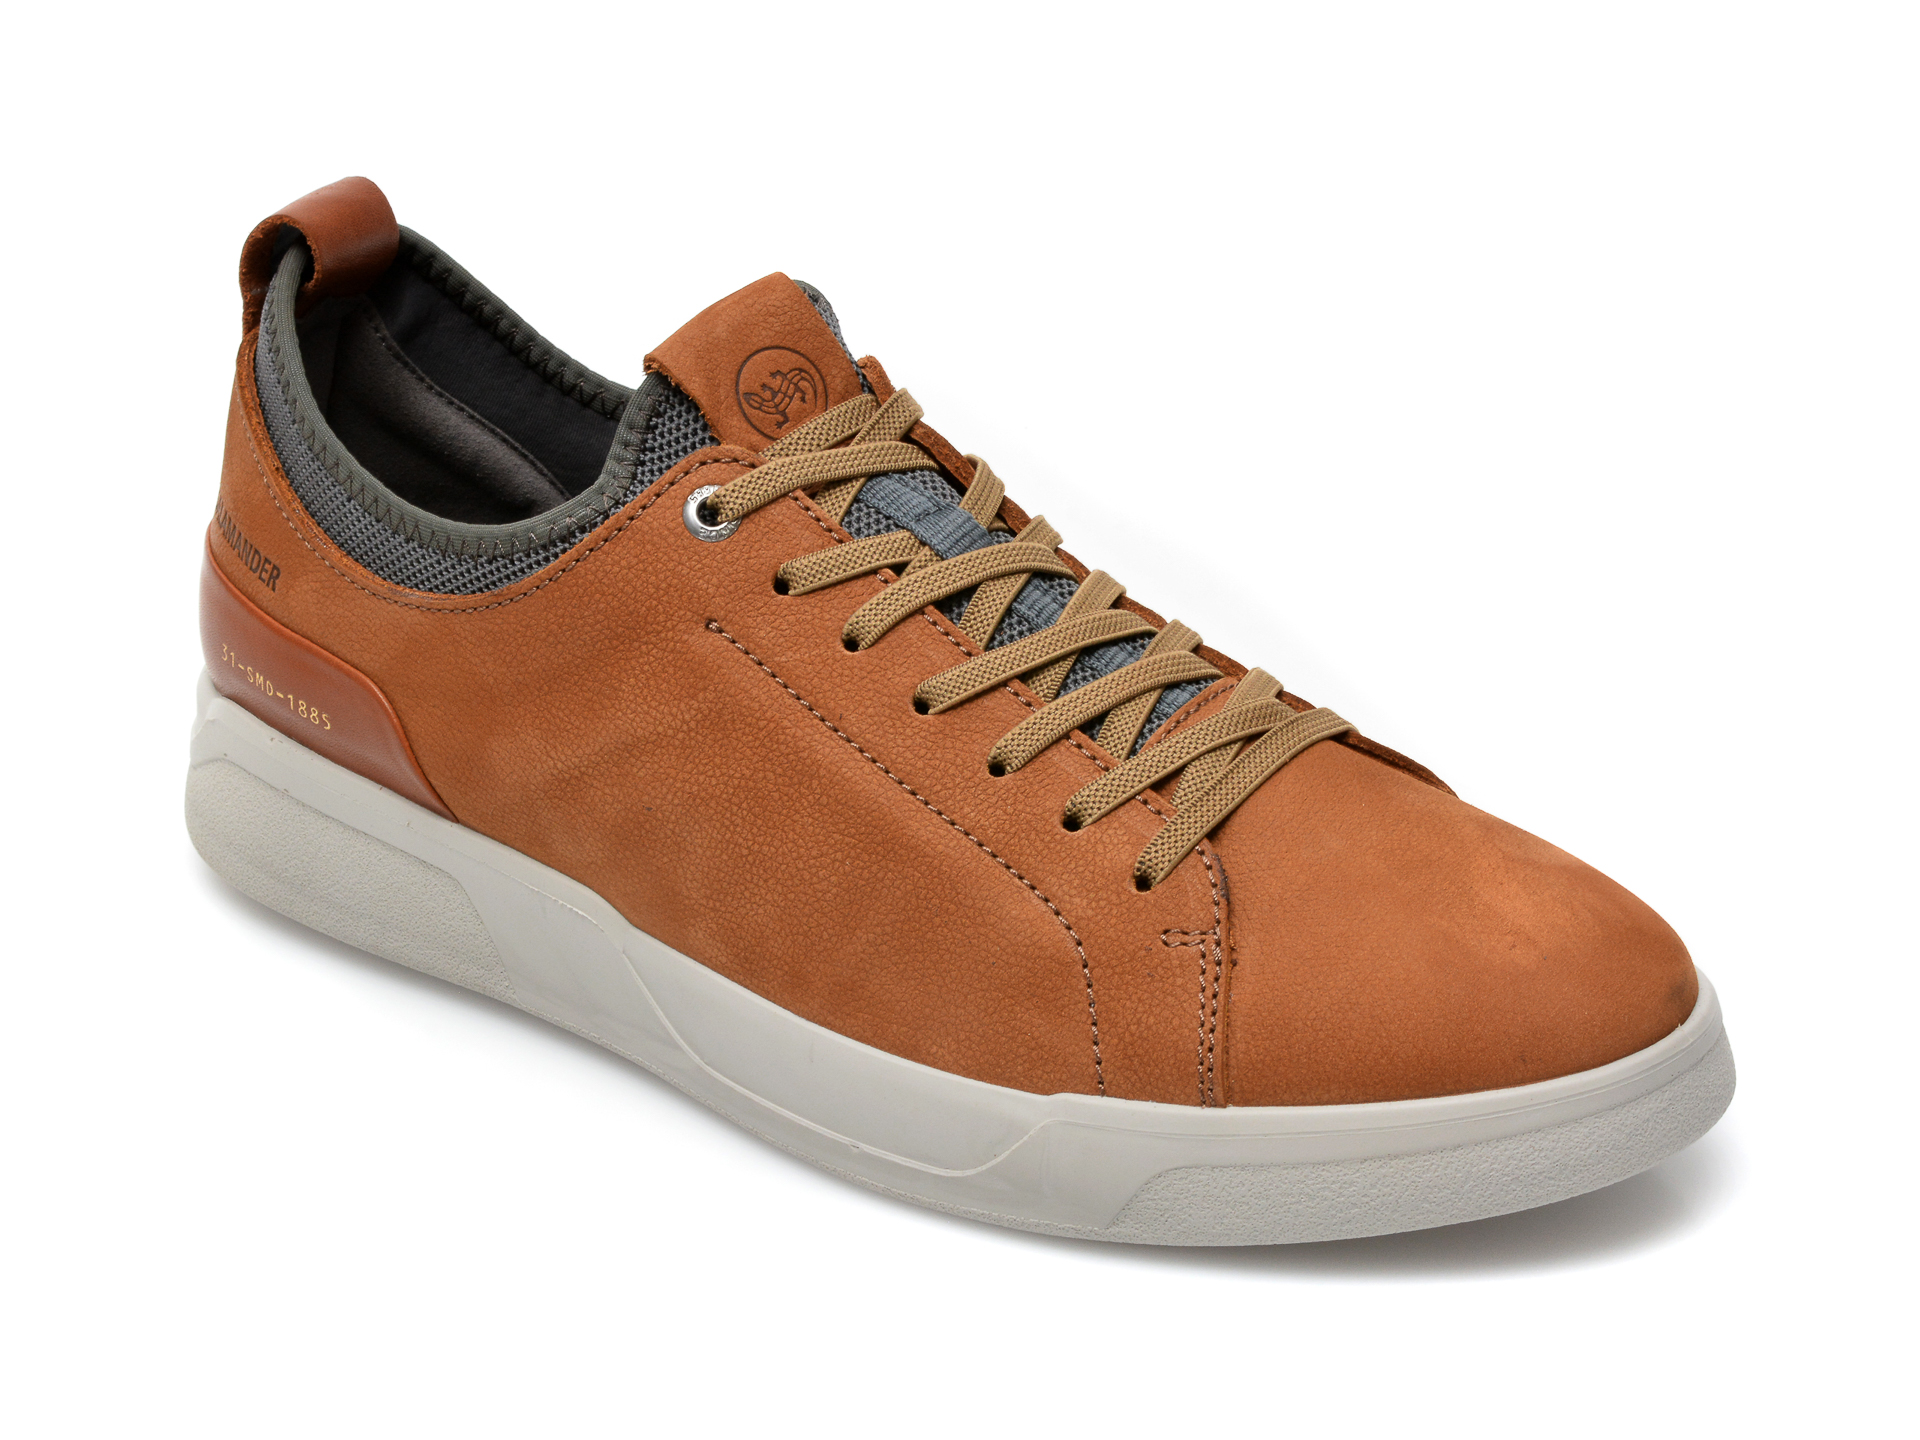 Pantofi SALAMANDER maro, 54502, din piele naturala imagine otter.ro 2021